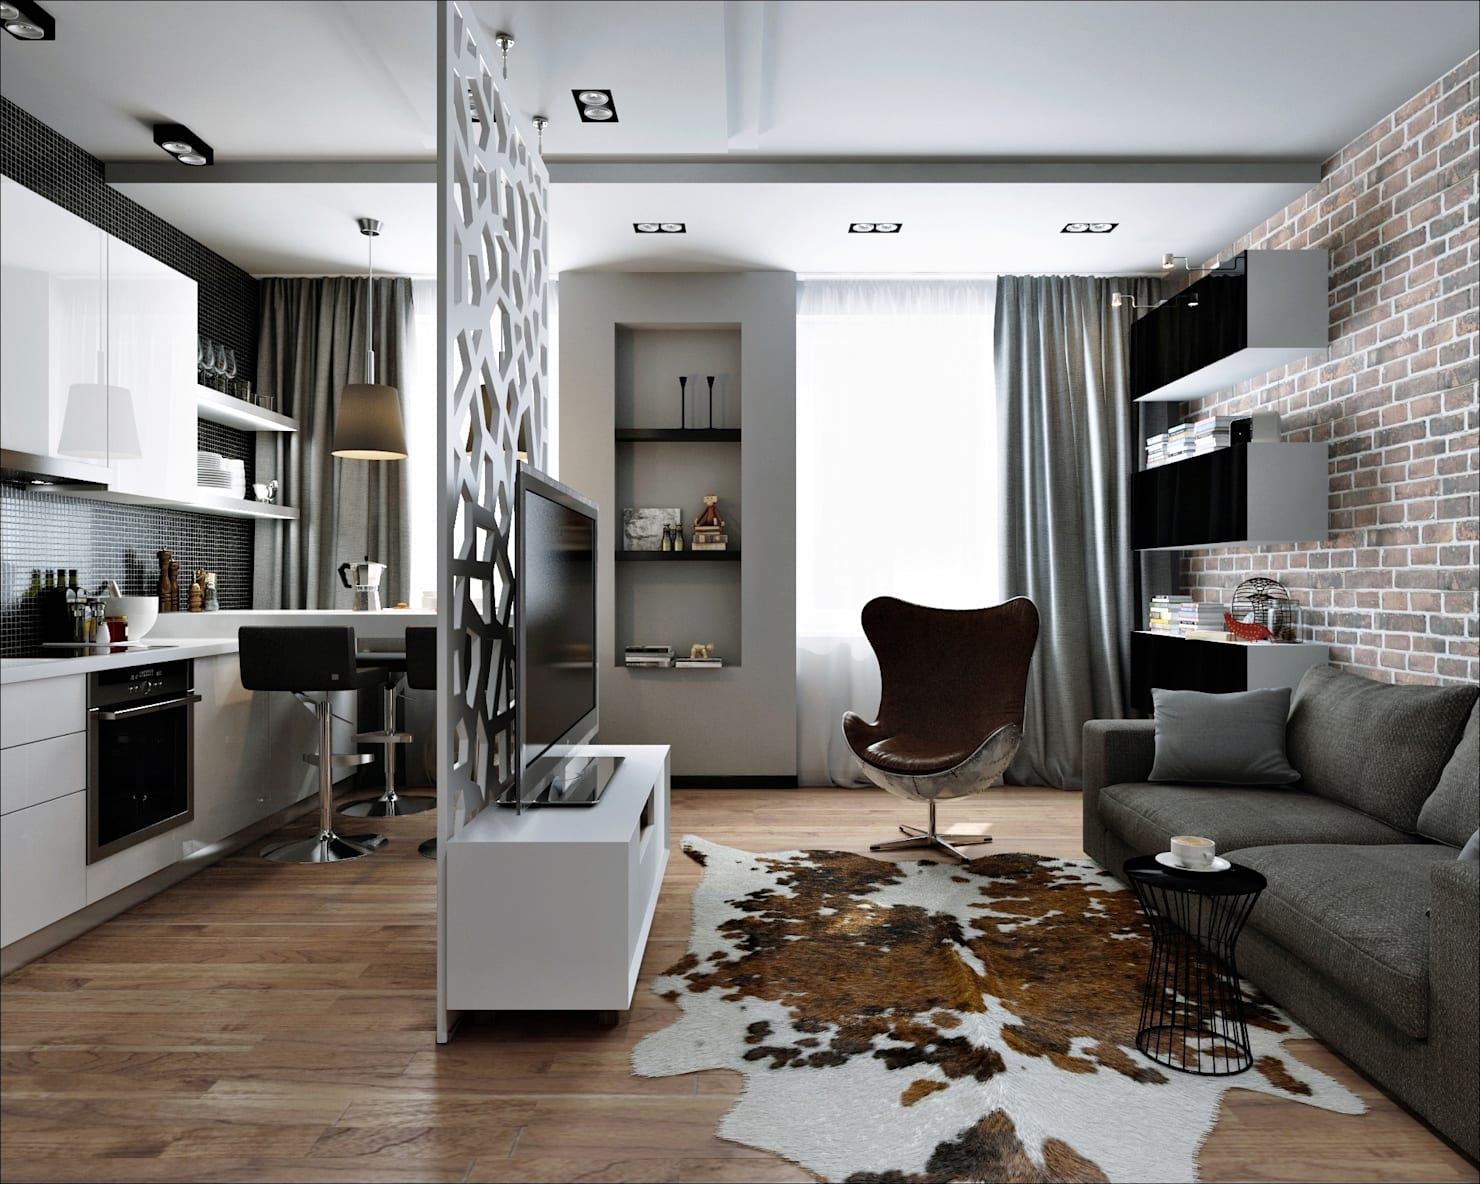 Дизайн квартиры 33 квадратных метра